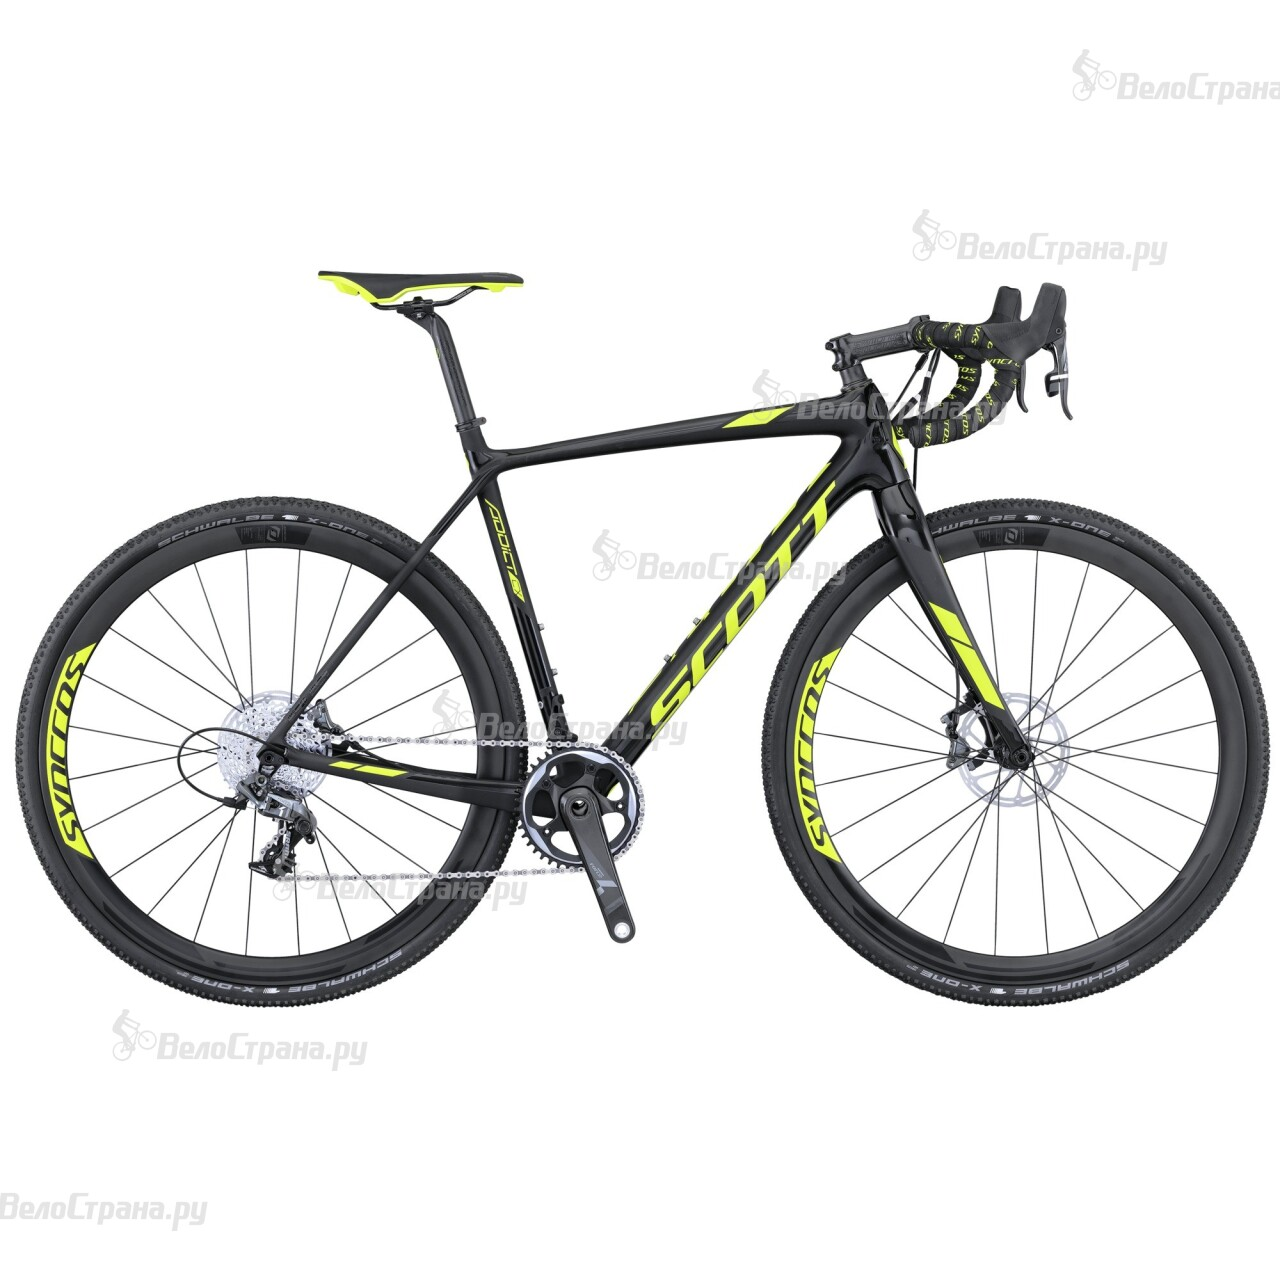 Велосипед Scott Addict CX 10 Disc (2016) scott addict sl compact 2015